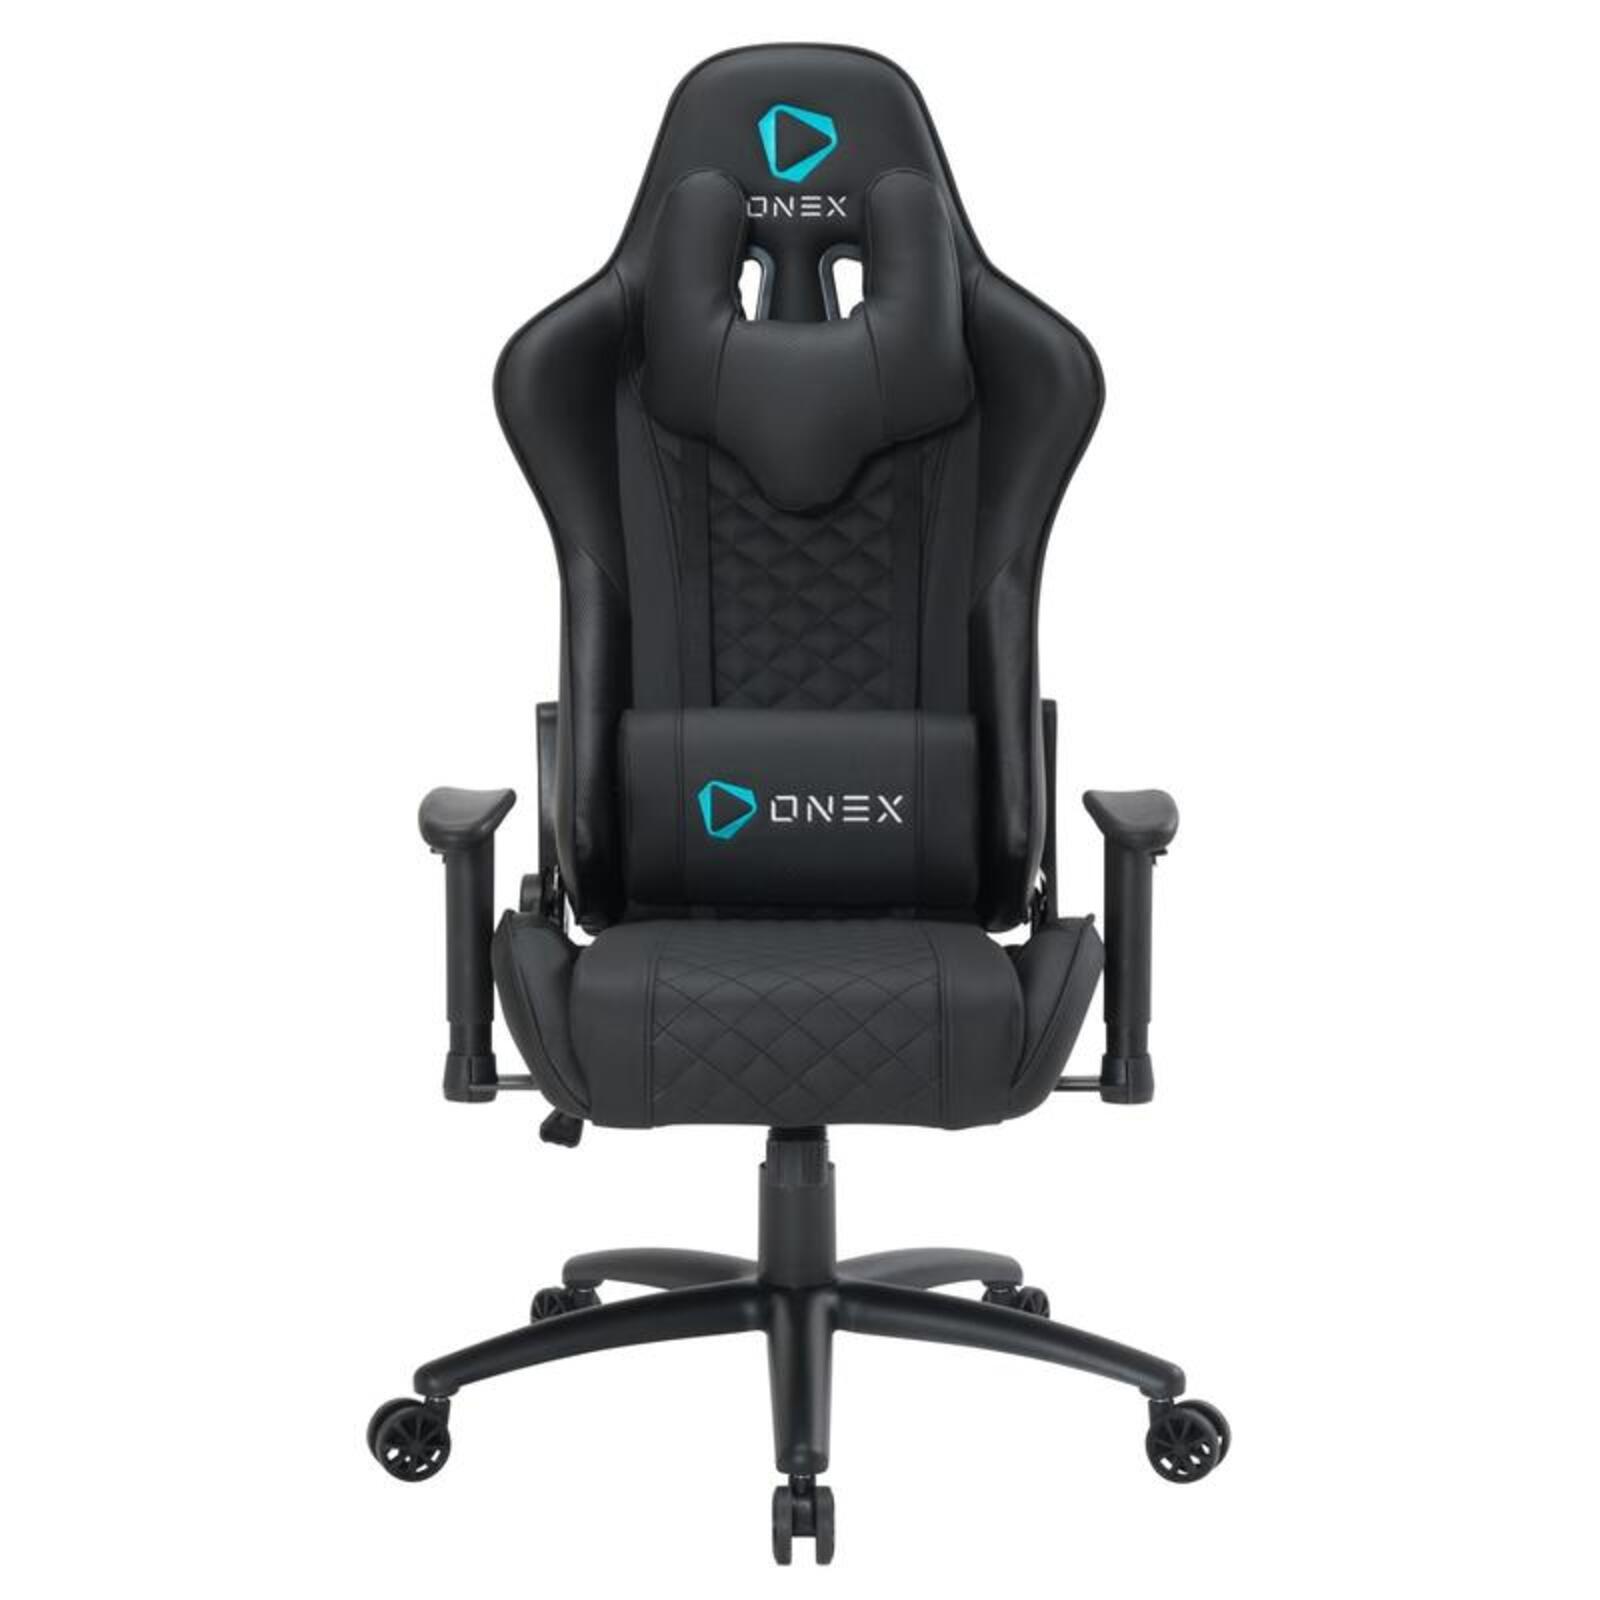 ONEX GX3 Series Black Gaming Chair